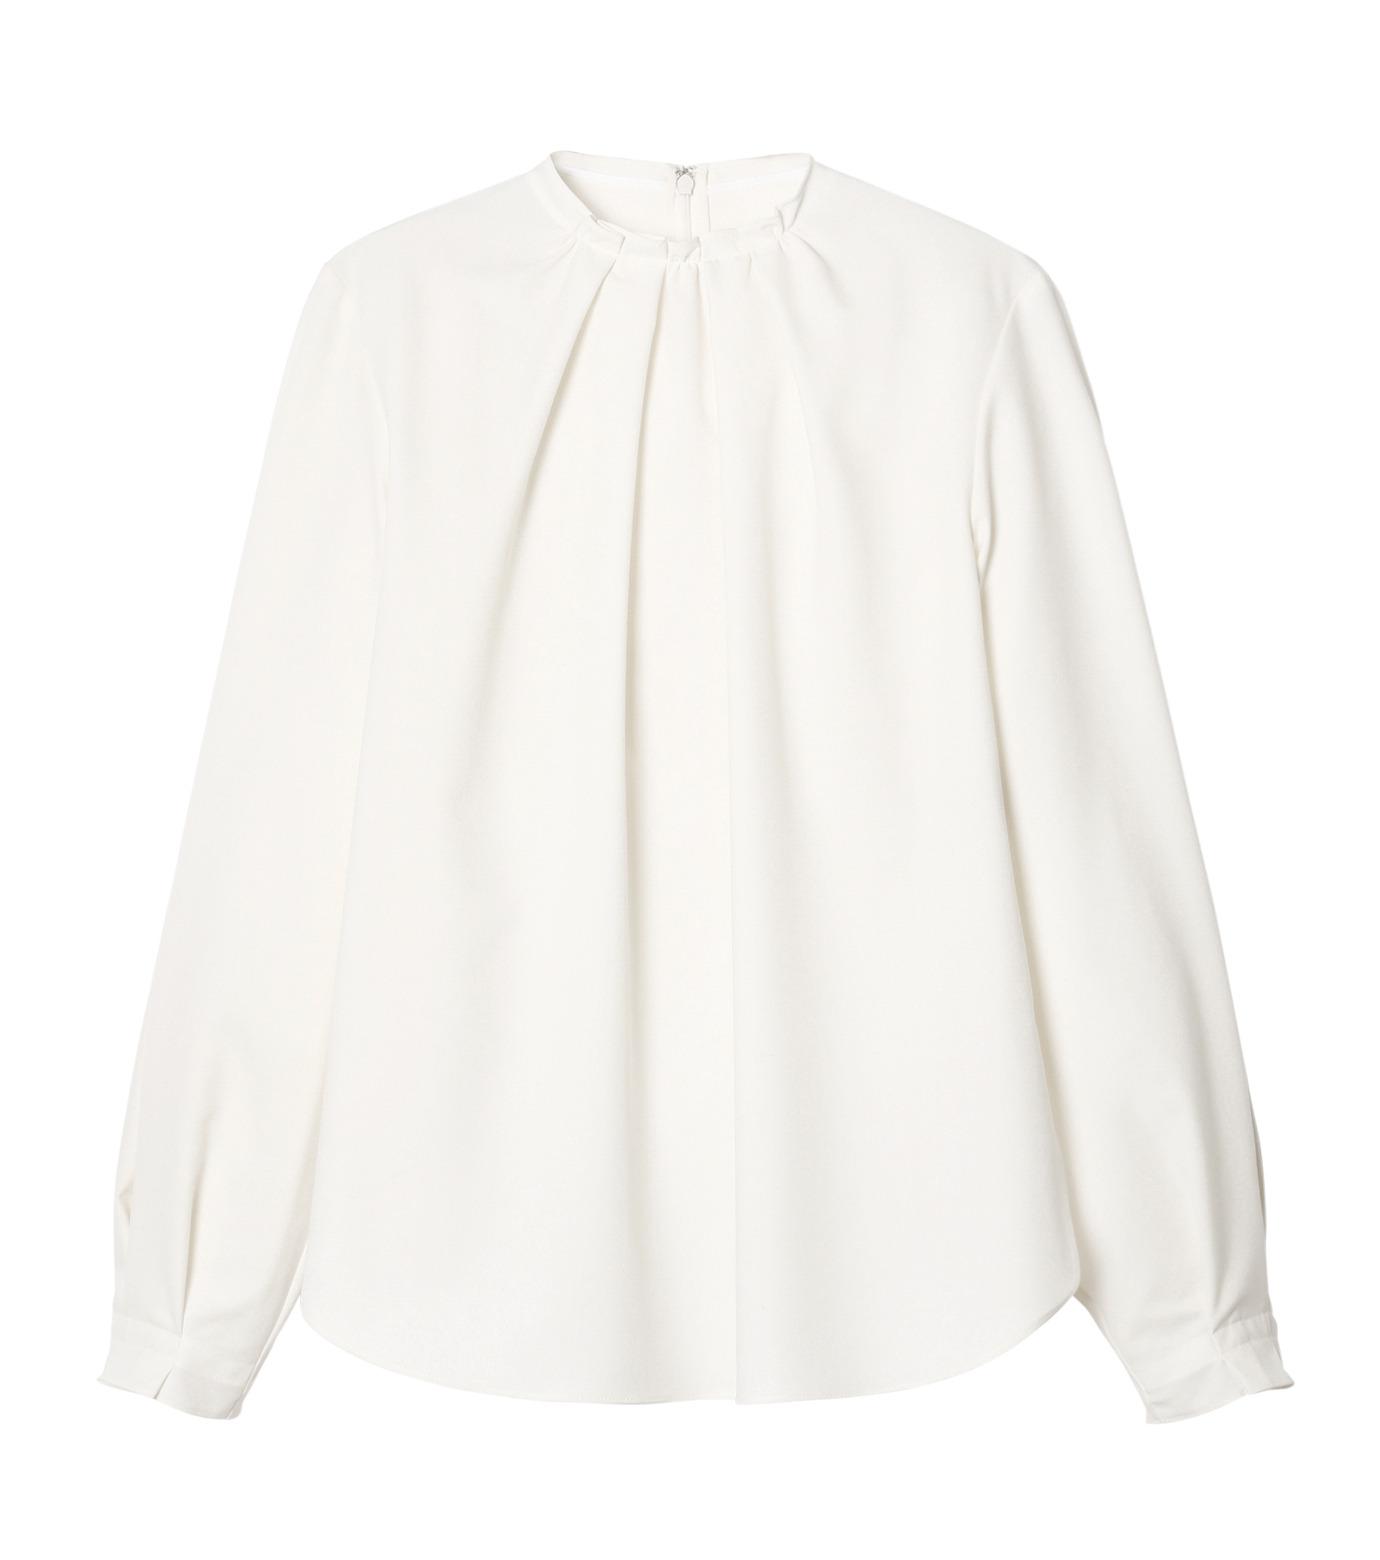 LE CIEL BLEU(ルシェルブルー)のミニマルパフスリーブトップス-WHITE(シャツ/shirt)-19S63108 拡大詳細画像1